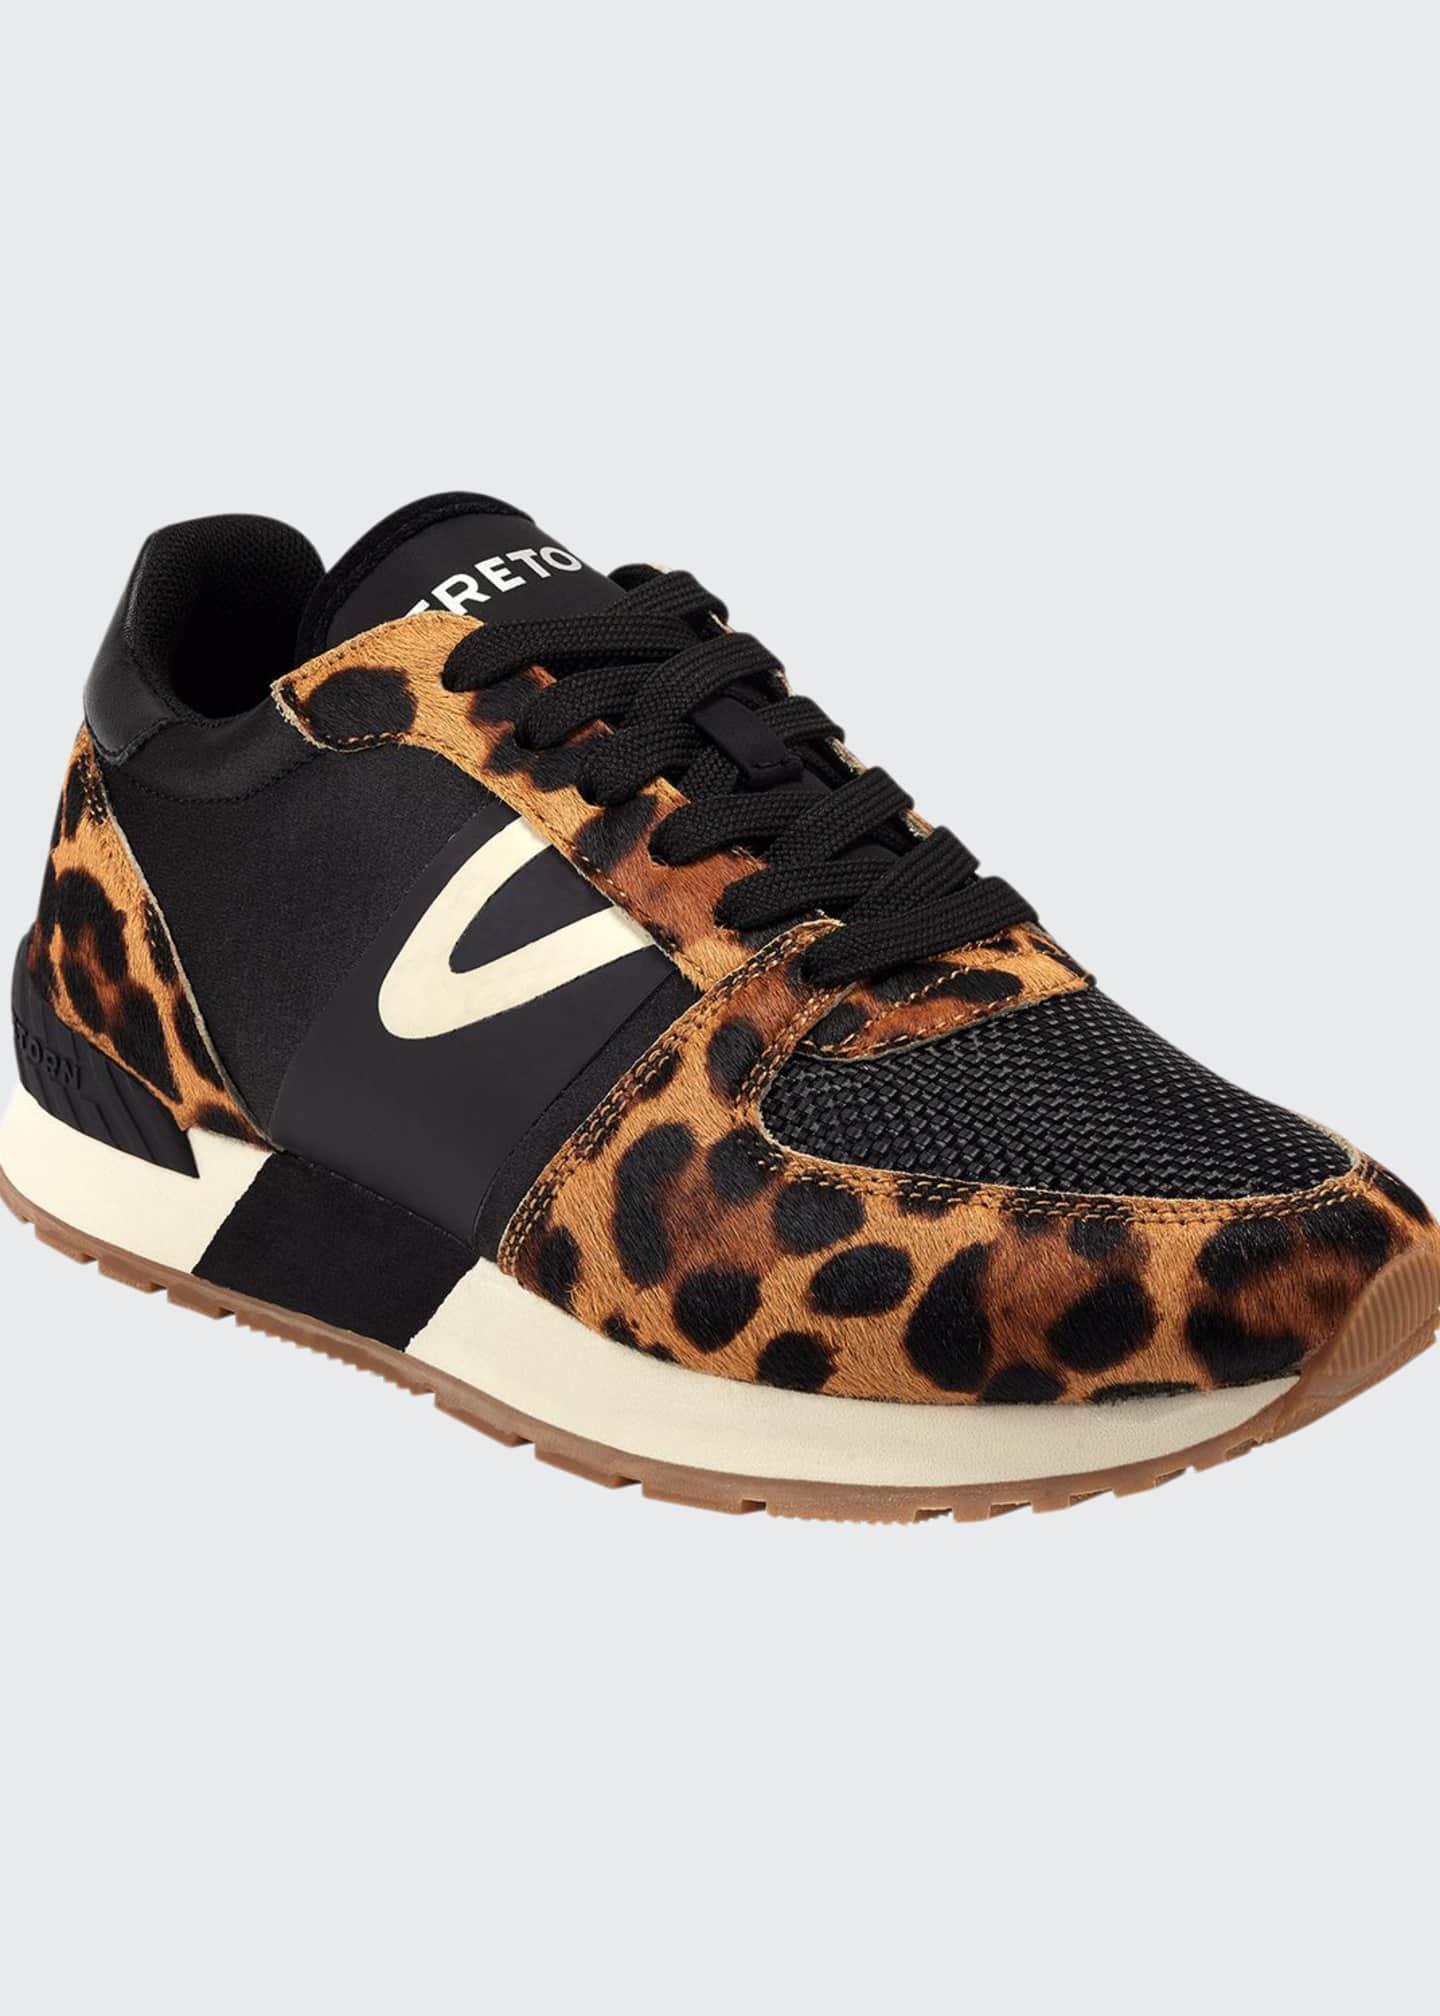 Tretorn Loyola 10 Leopard-Print Fur Trainer Sneakers